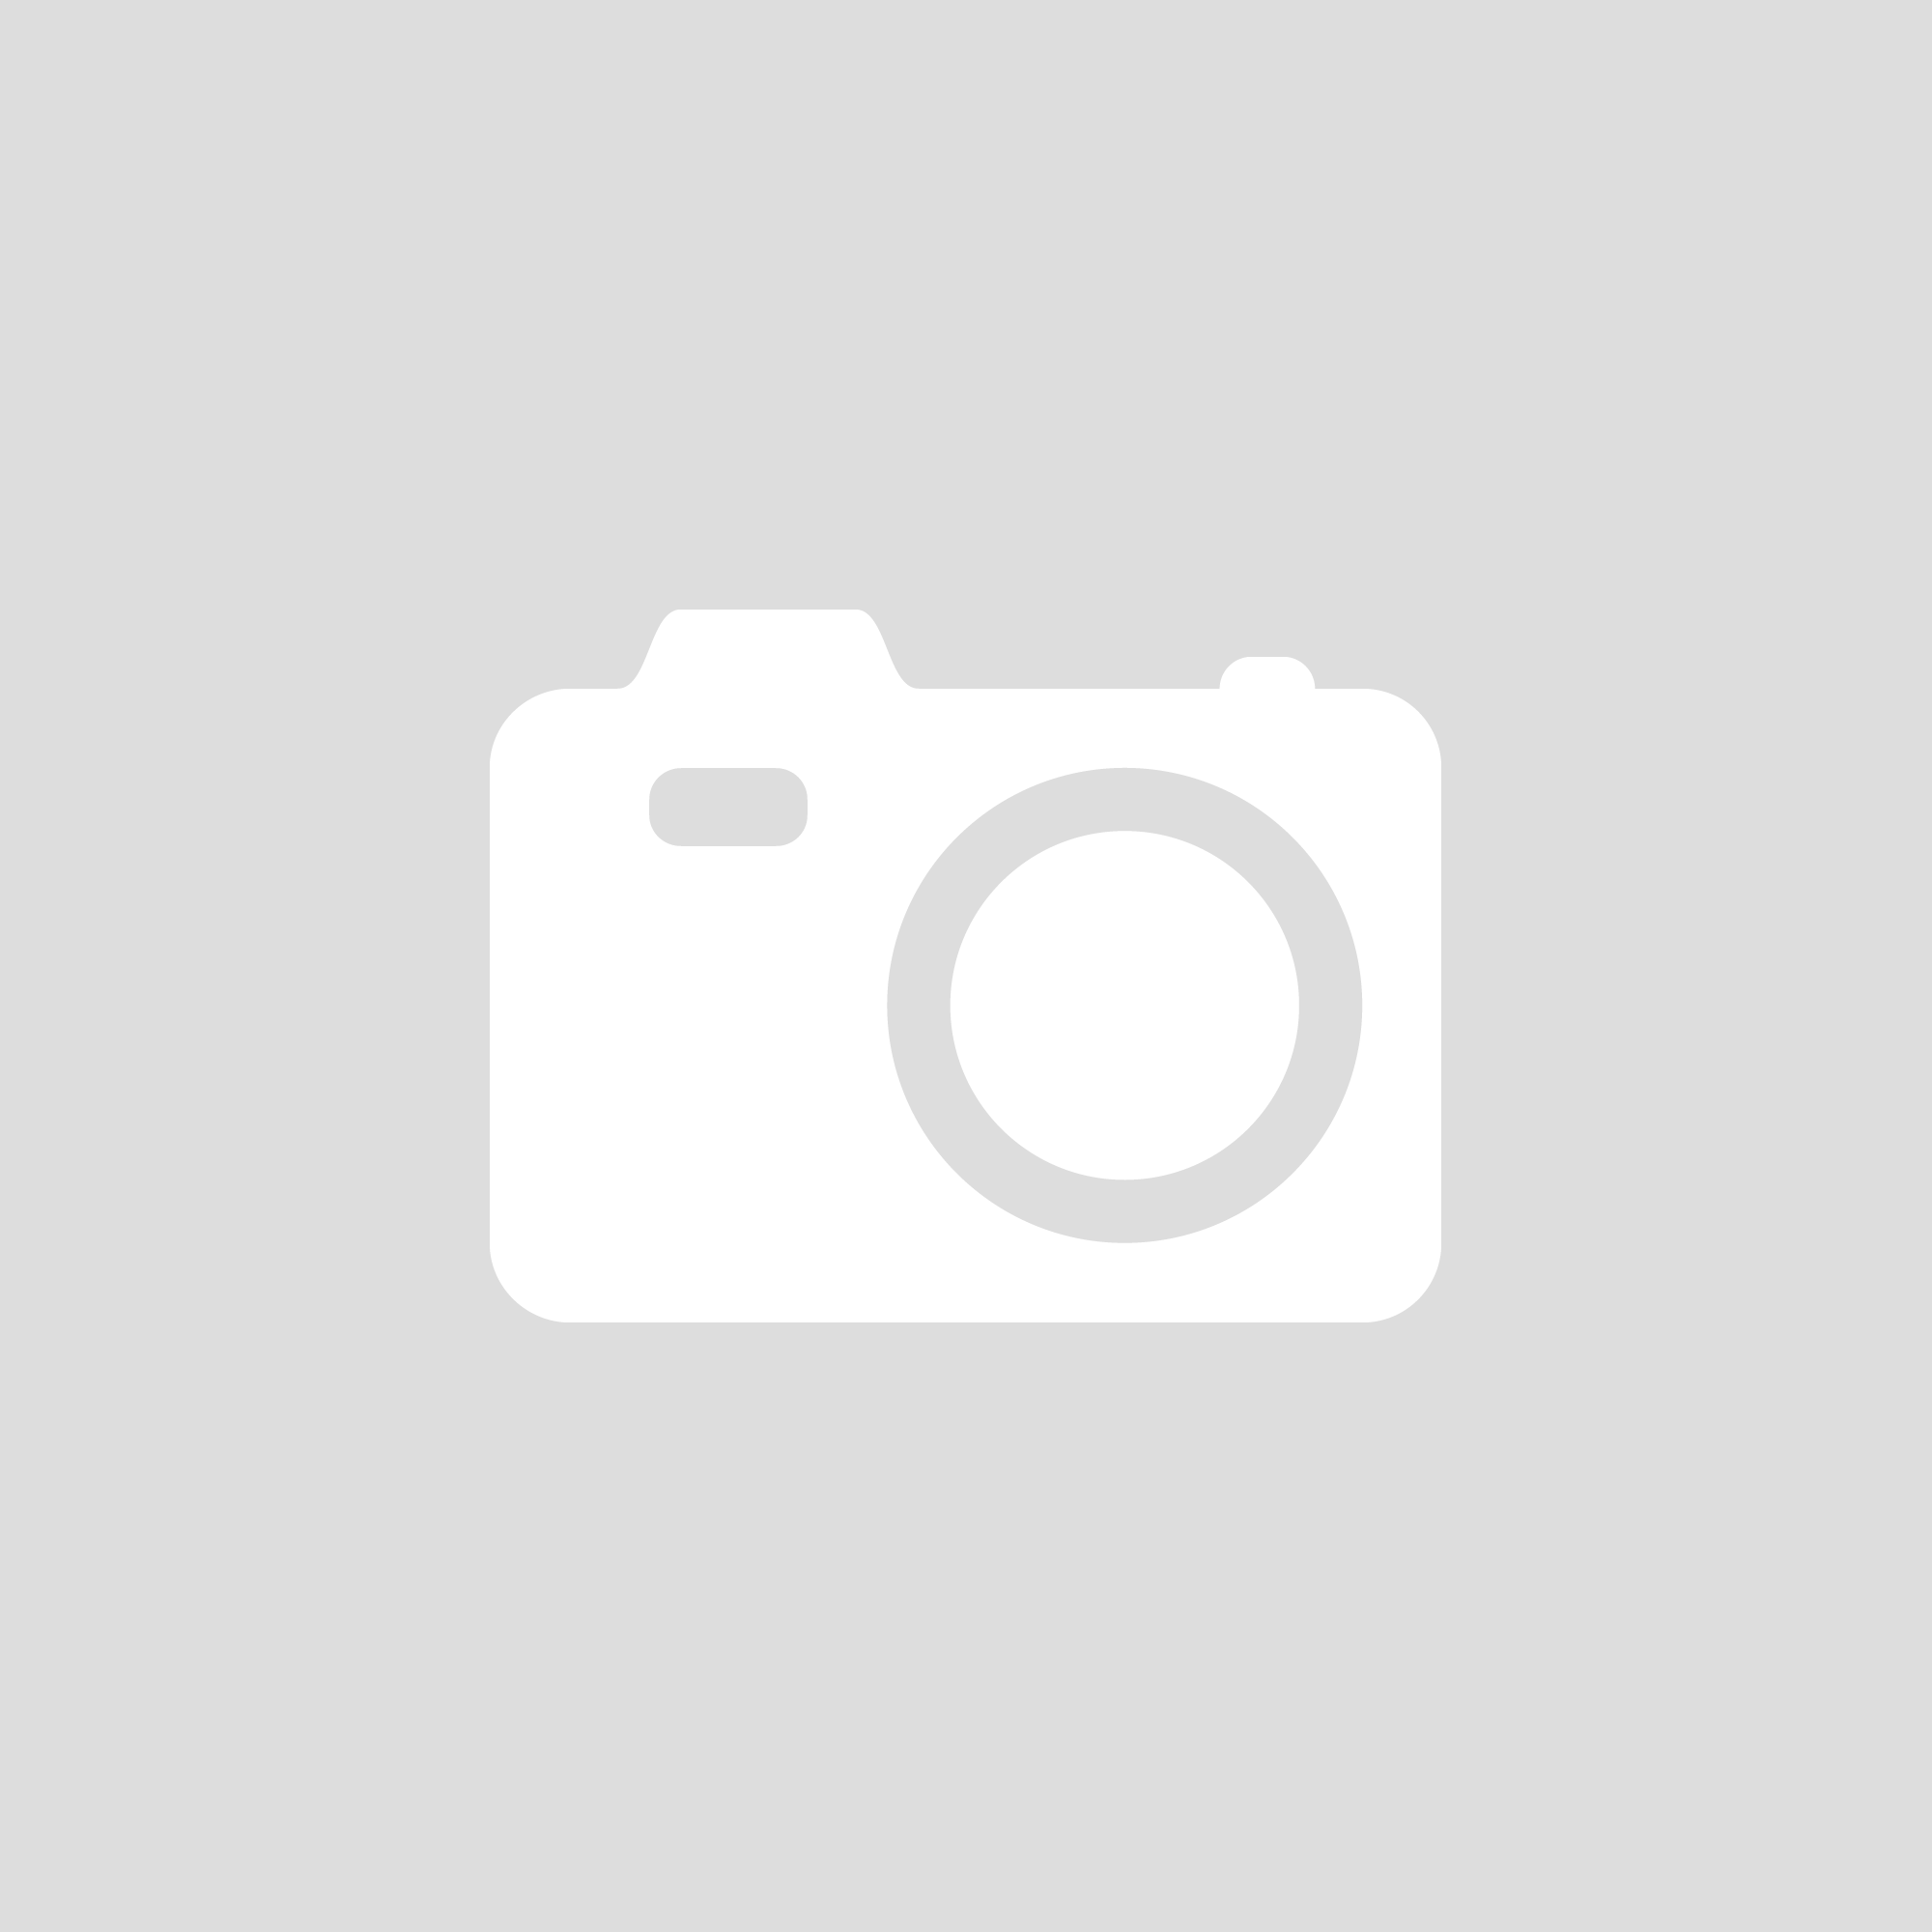 Premium Geometric Grey / Lilac Border By Ideco V112-01